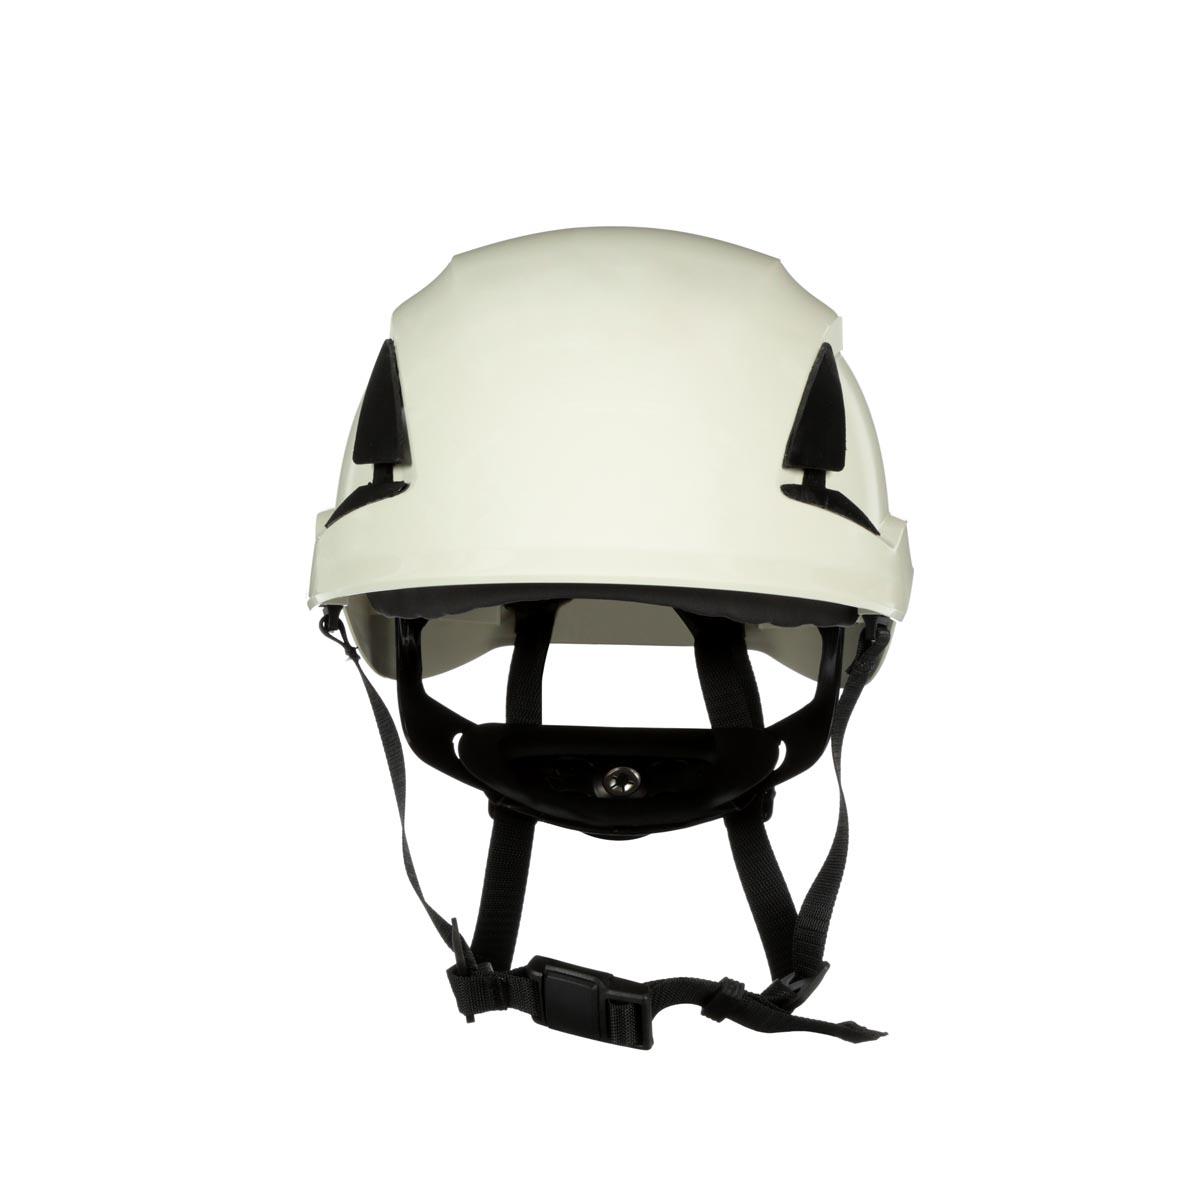 3M SecureFit Safety Helmet  X5001-ANSI   White  10 EA/Case